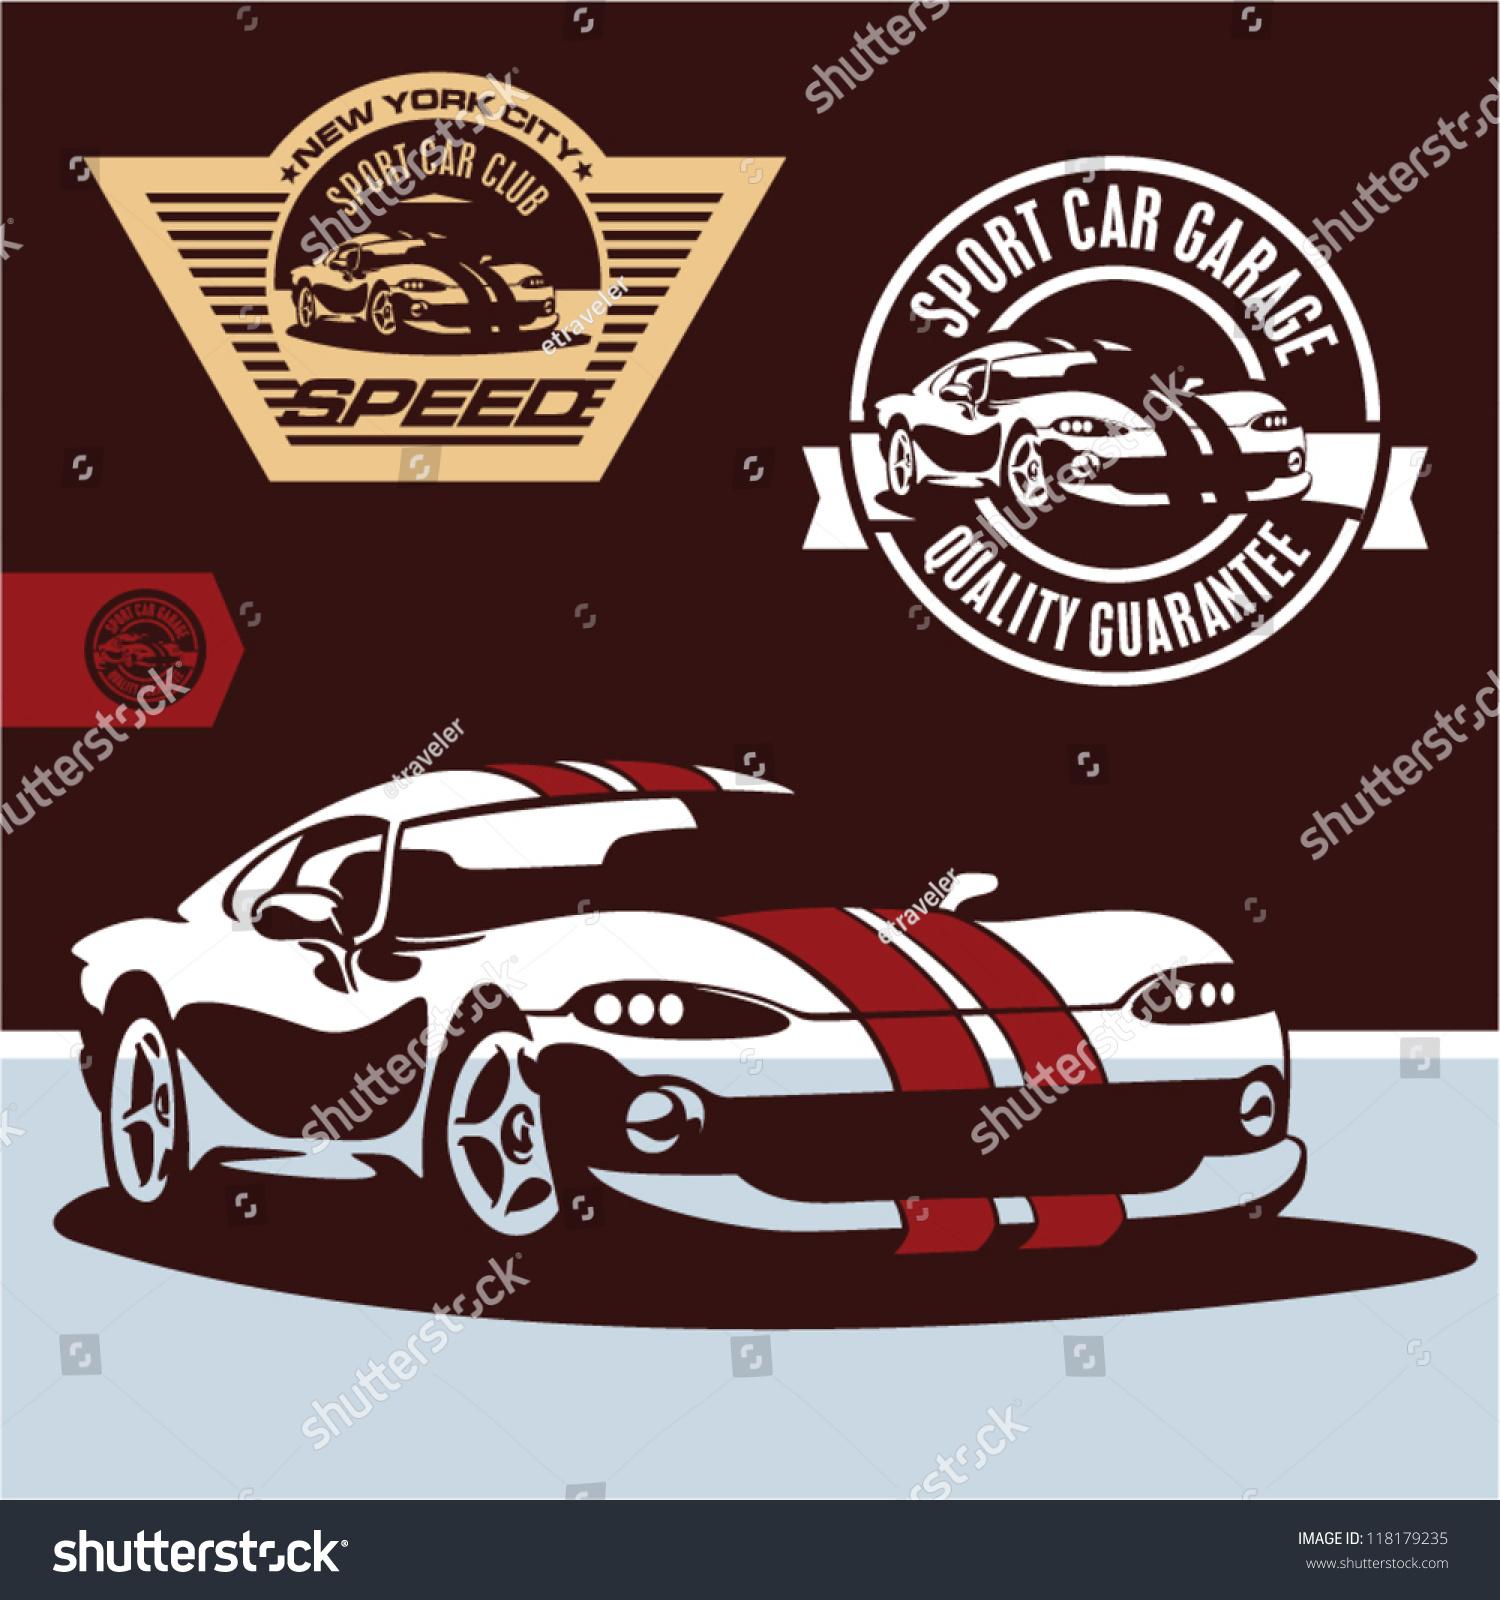 Design car club logo - Sports Car Vector Sports Car Club Emblem Label And Stamp Set